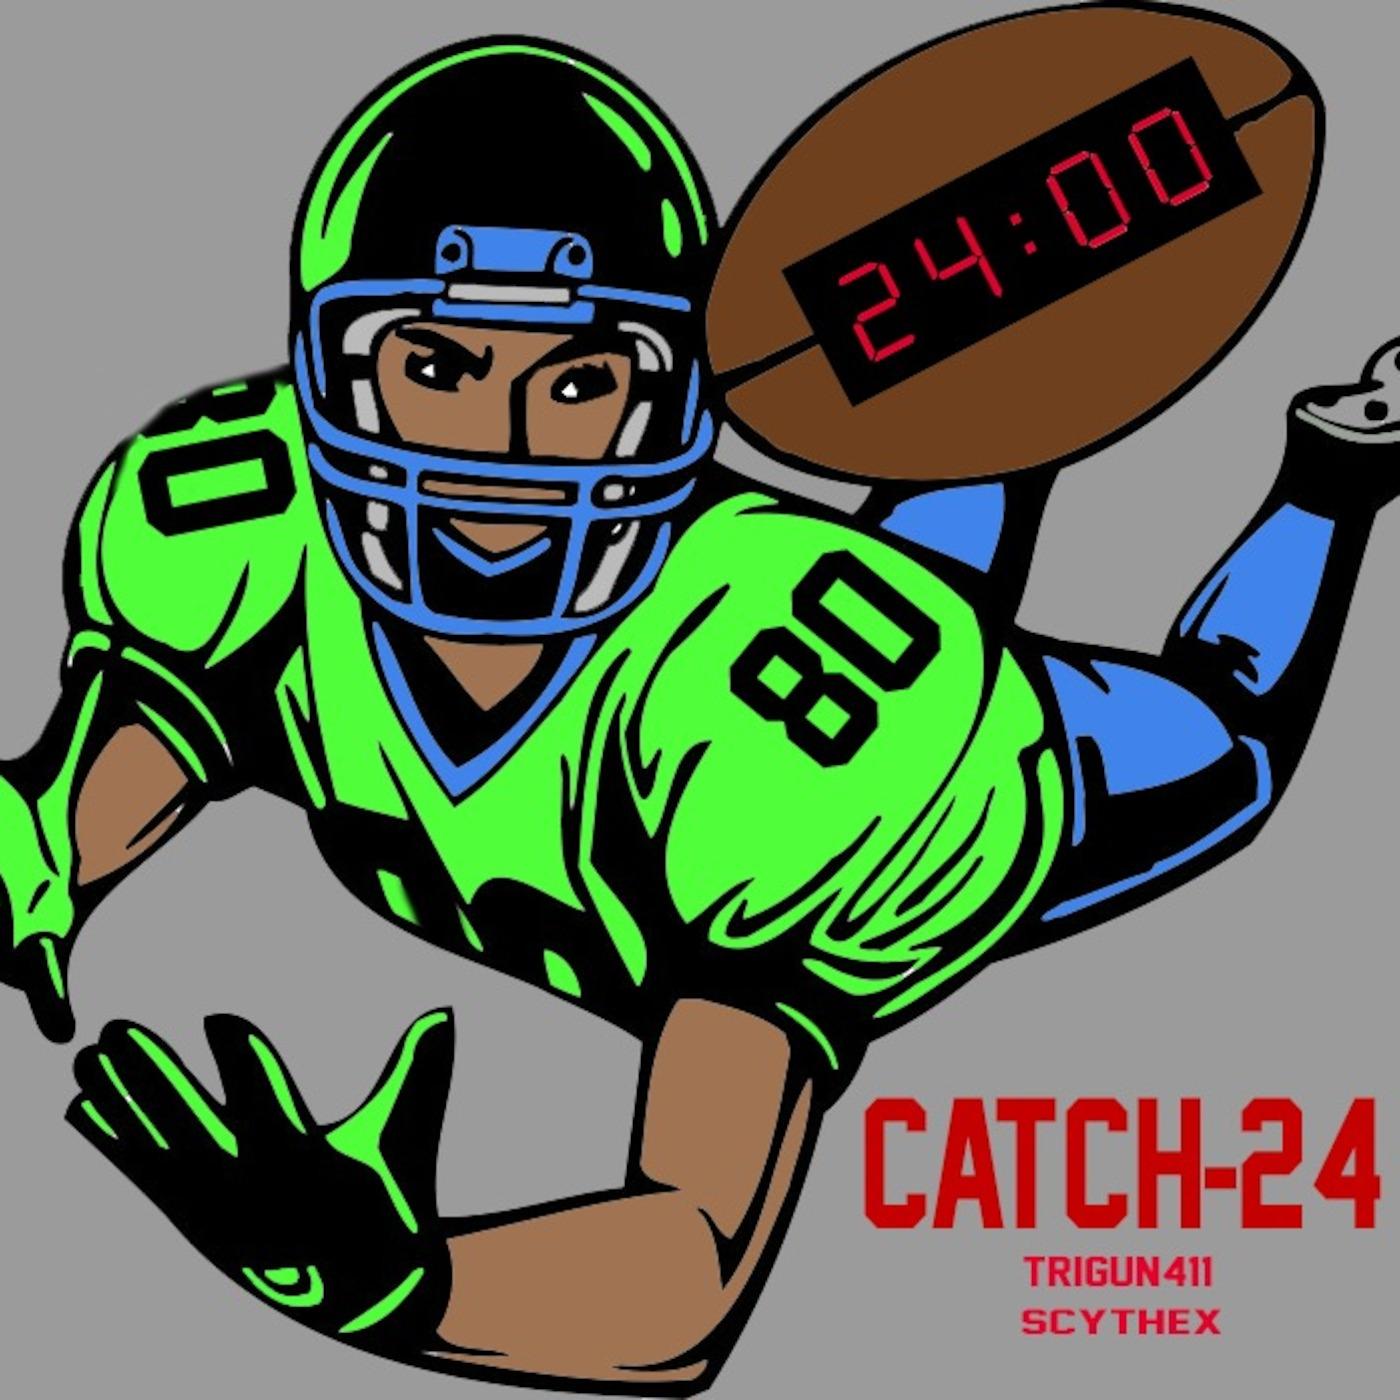 Catch-24 Episode 2!